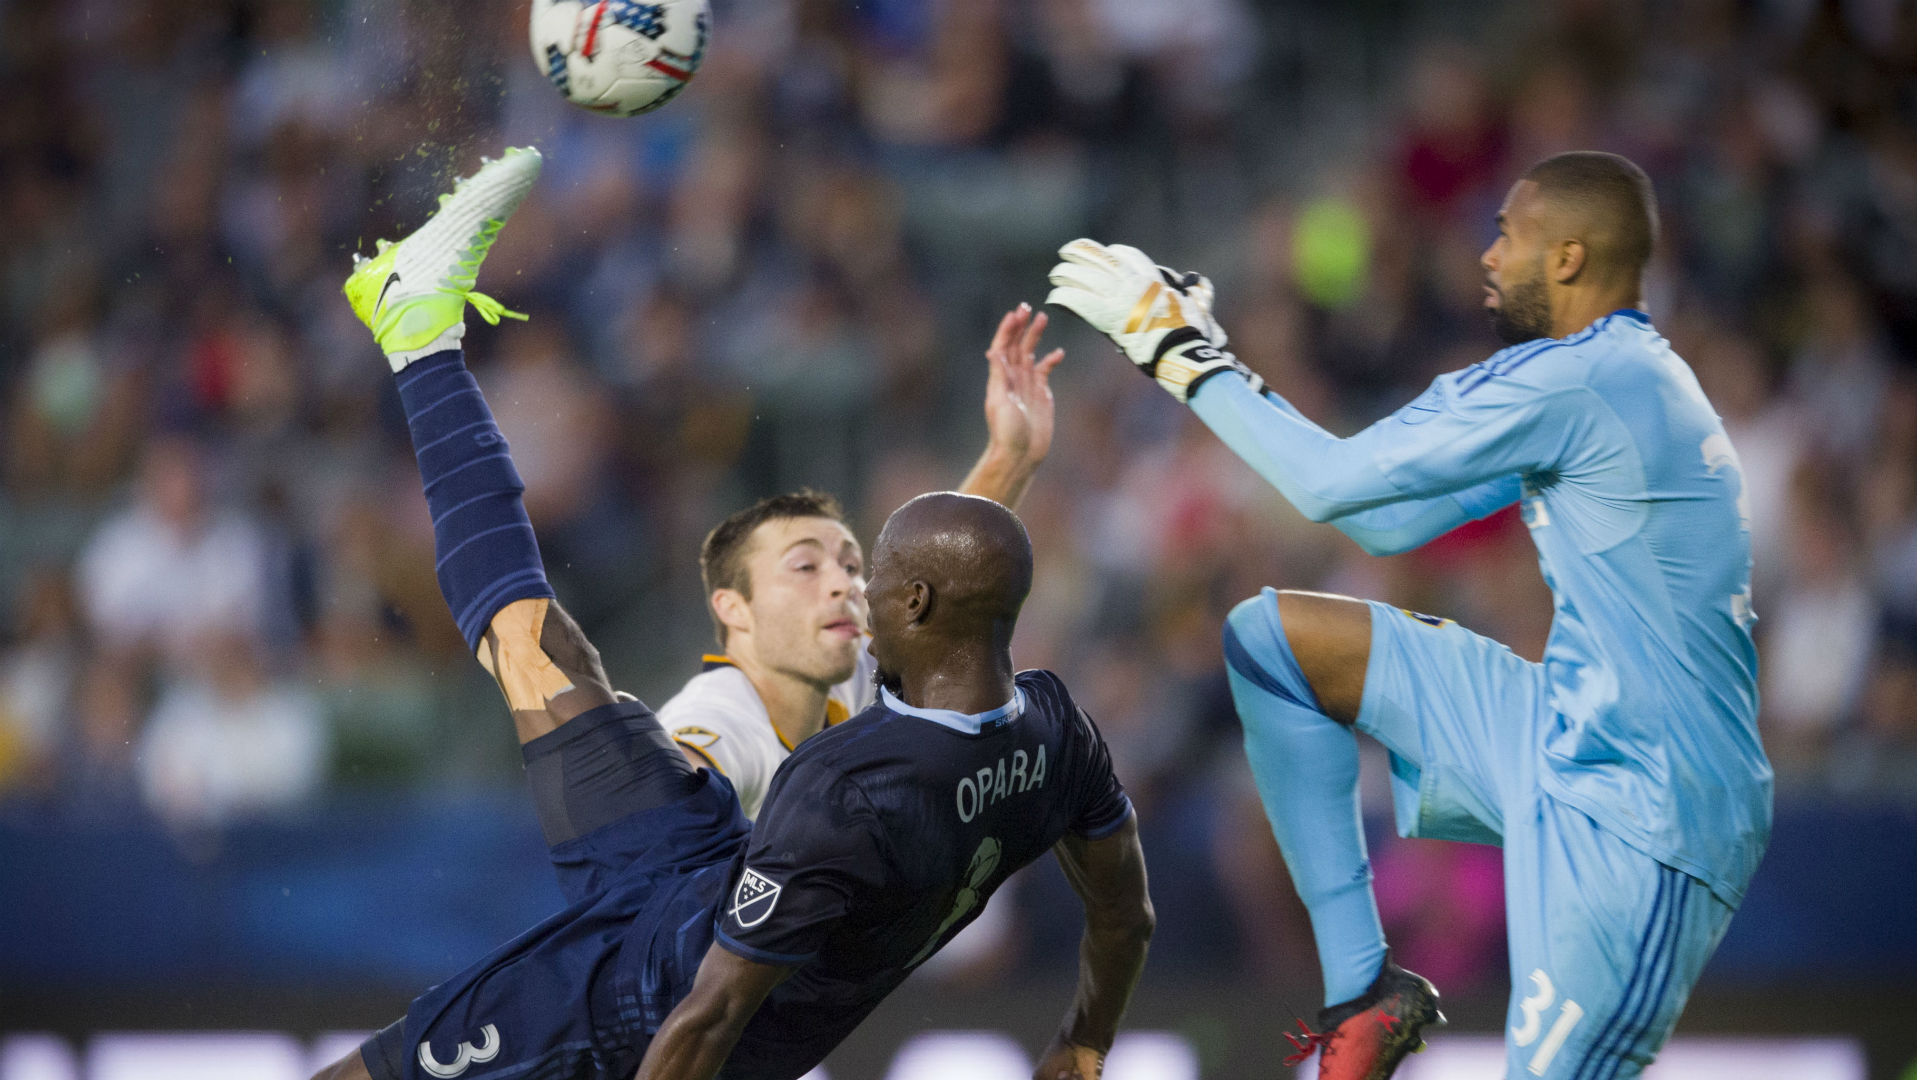 Ike Opara Sporting Kansas City LA Galaxy MLS